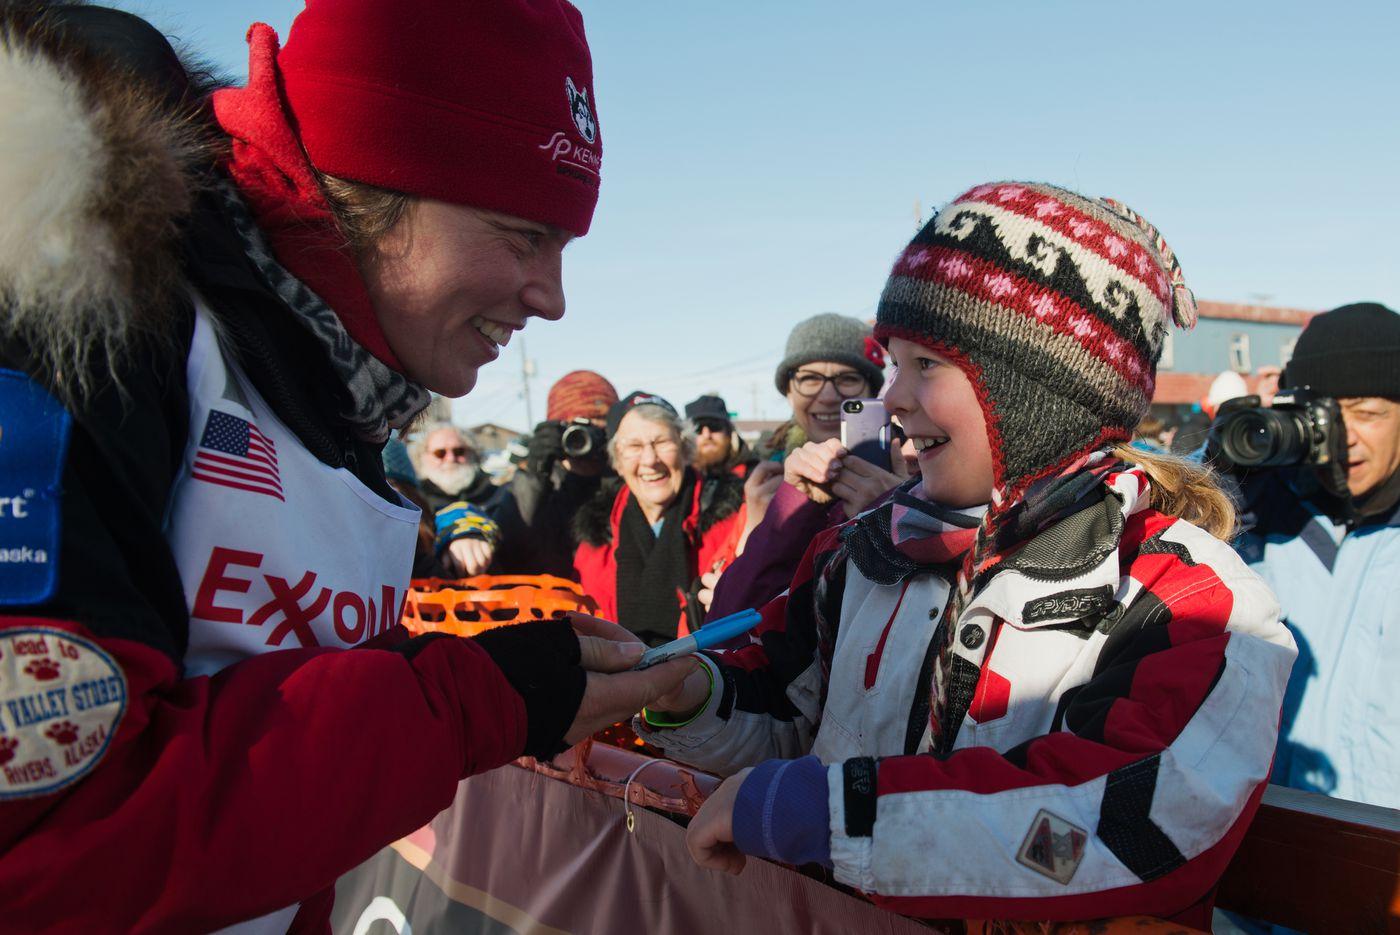 Aliy Zirkle talks with a fan in Nome on Wednesday, March 18, 2015. (Marc Lester / ADN archive)